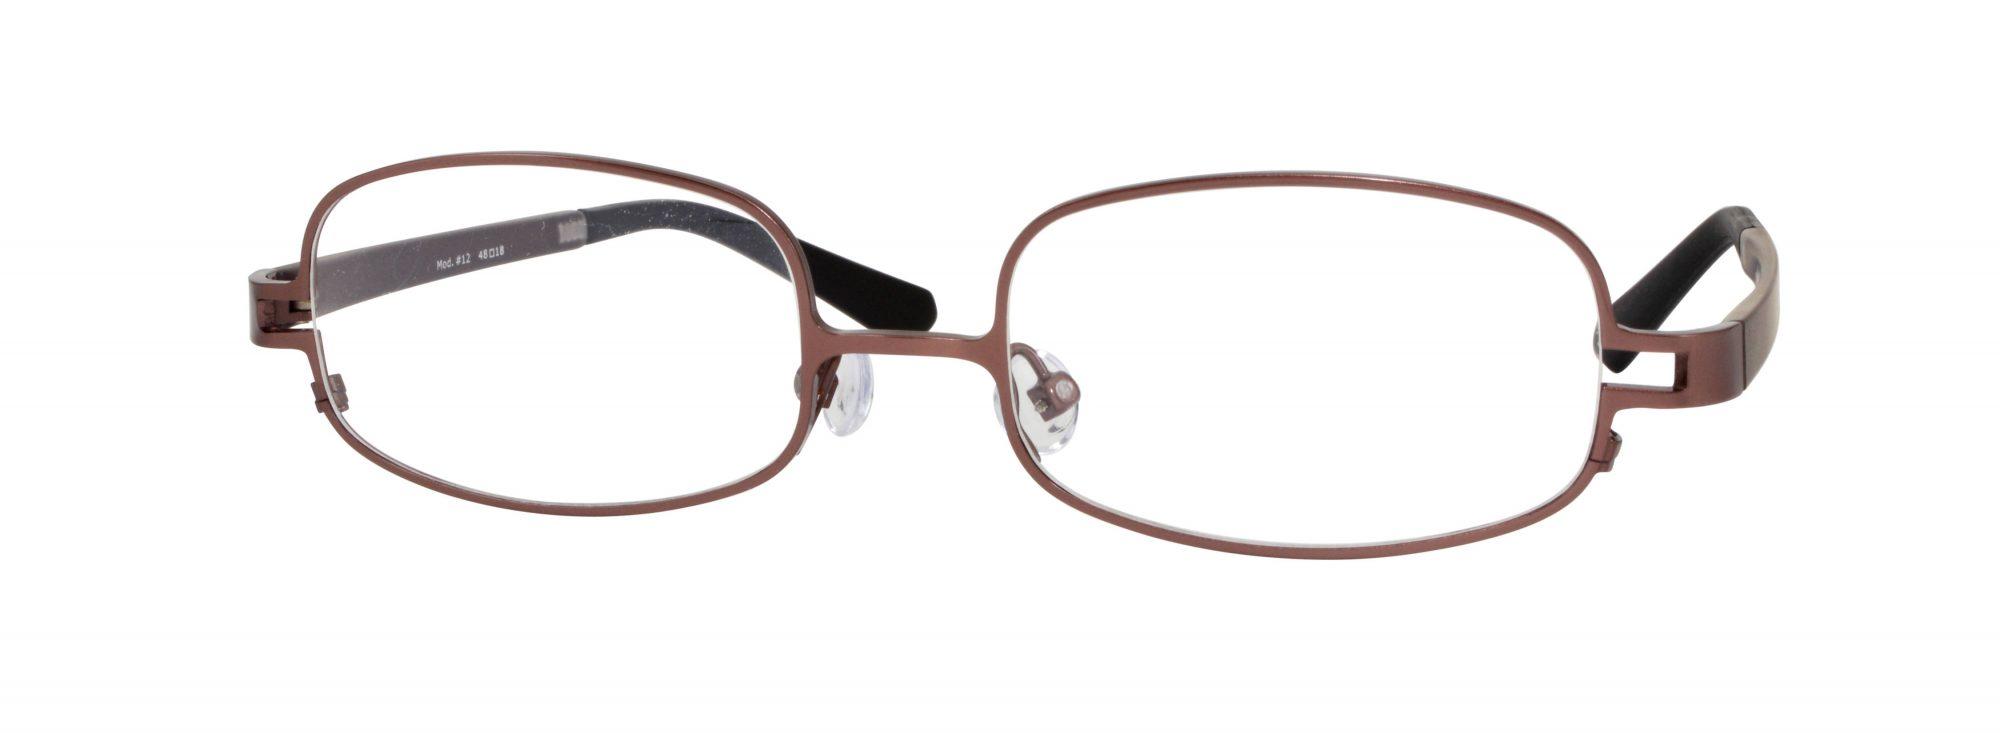 Erin's World frame style number EW-12 in matt brown